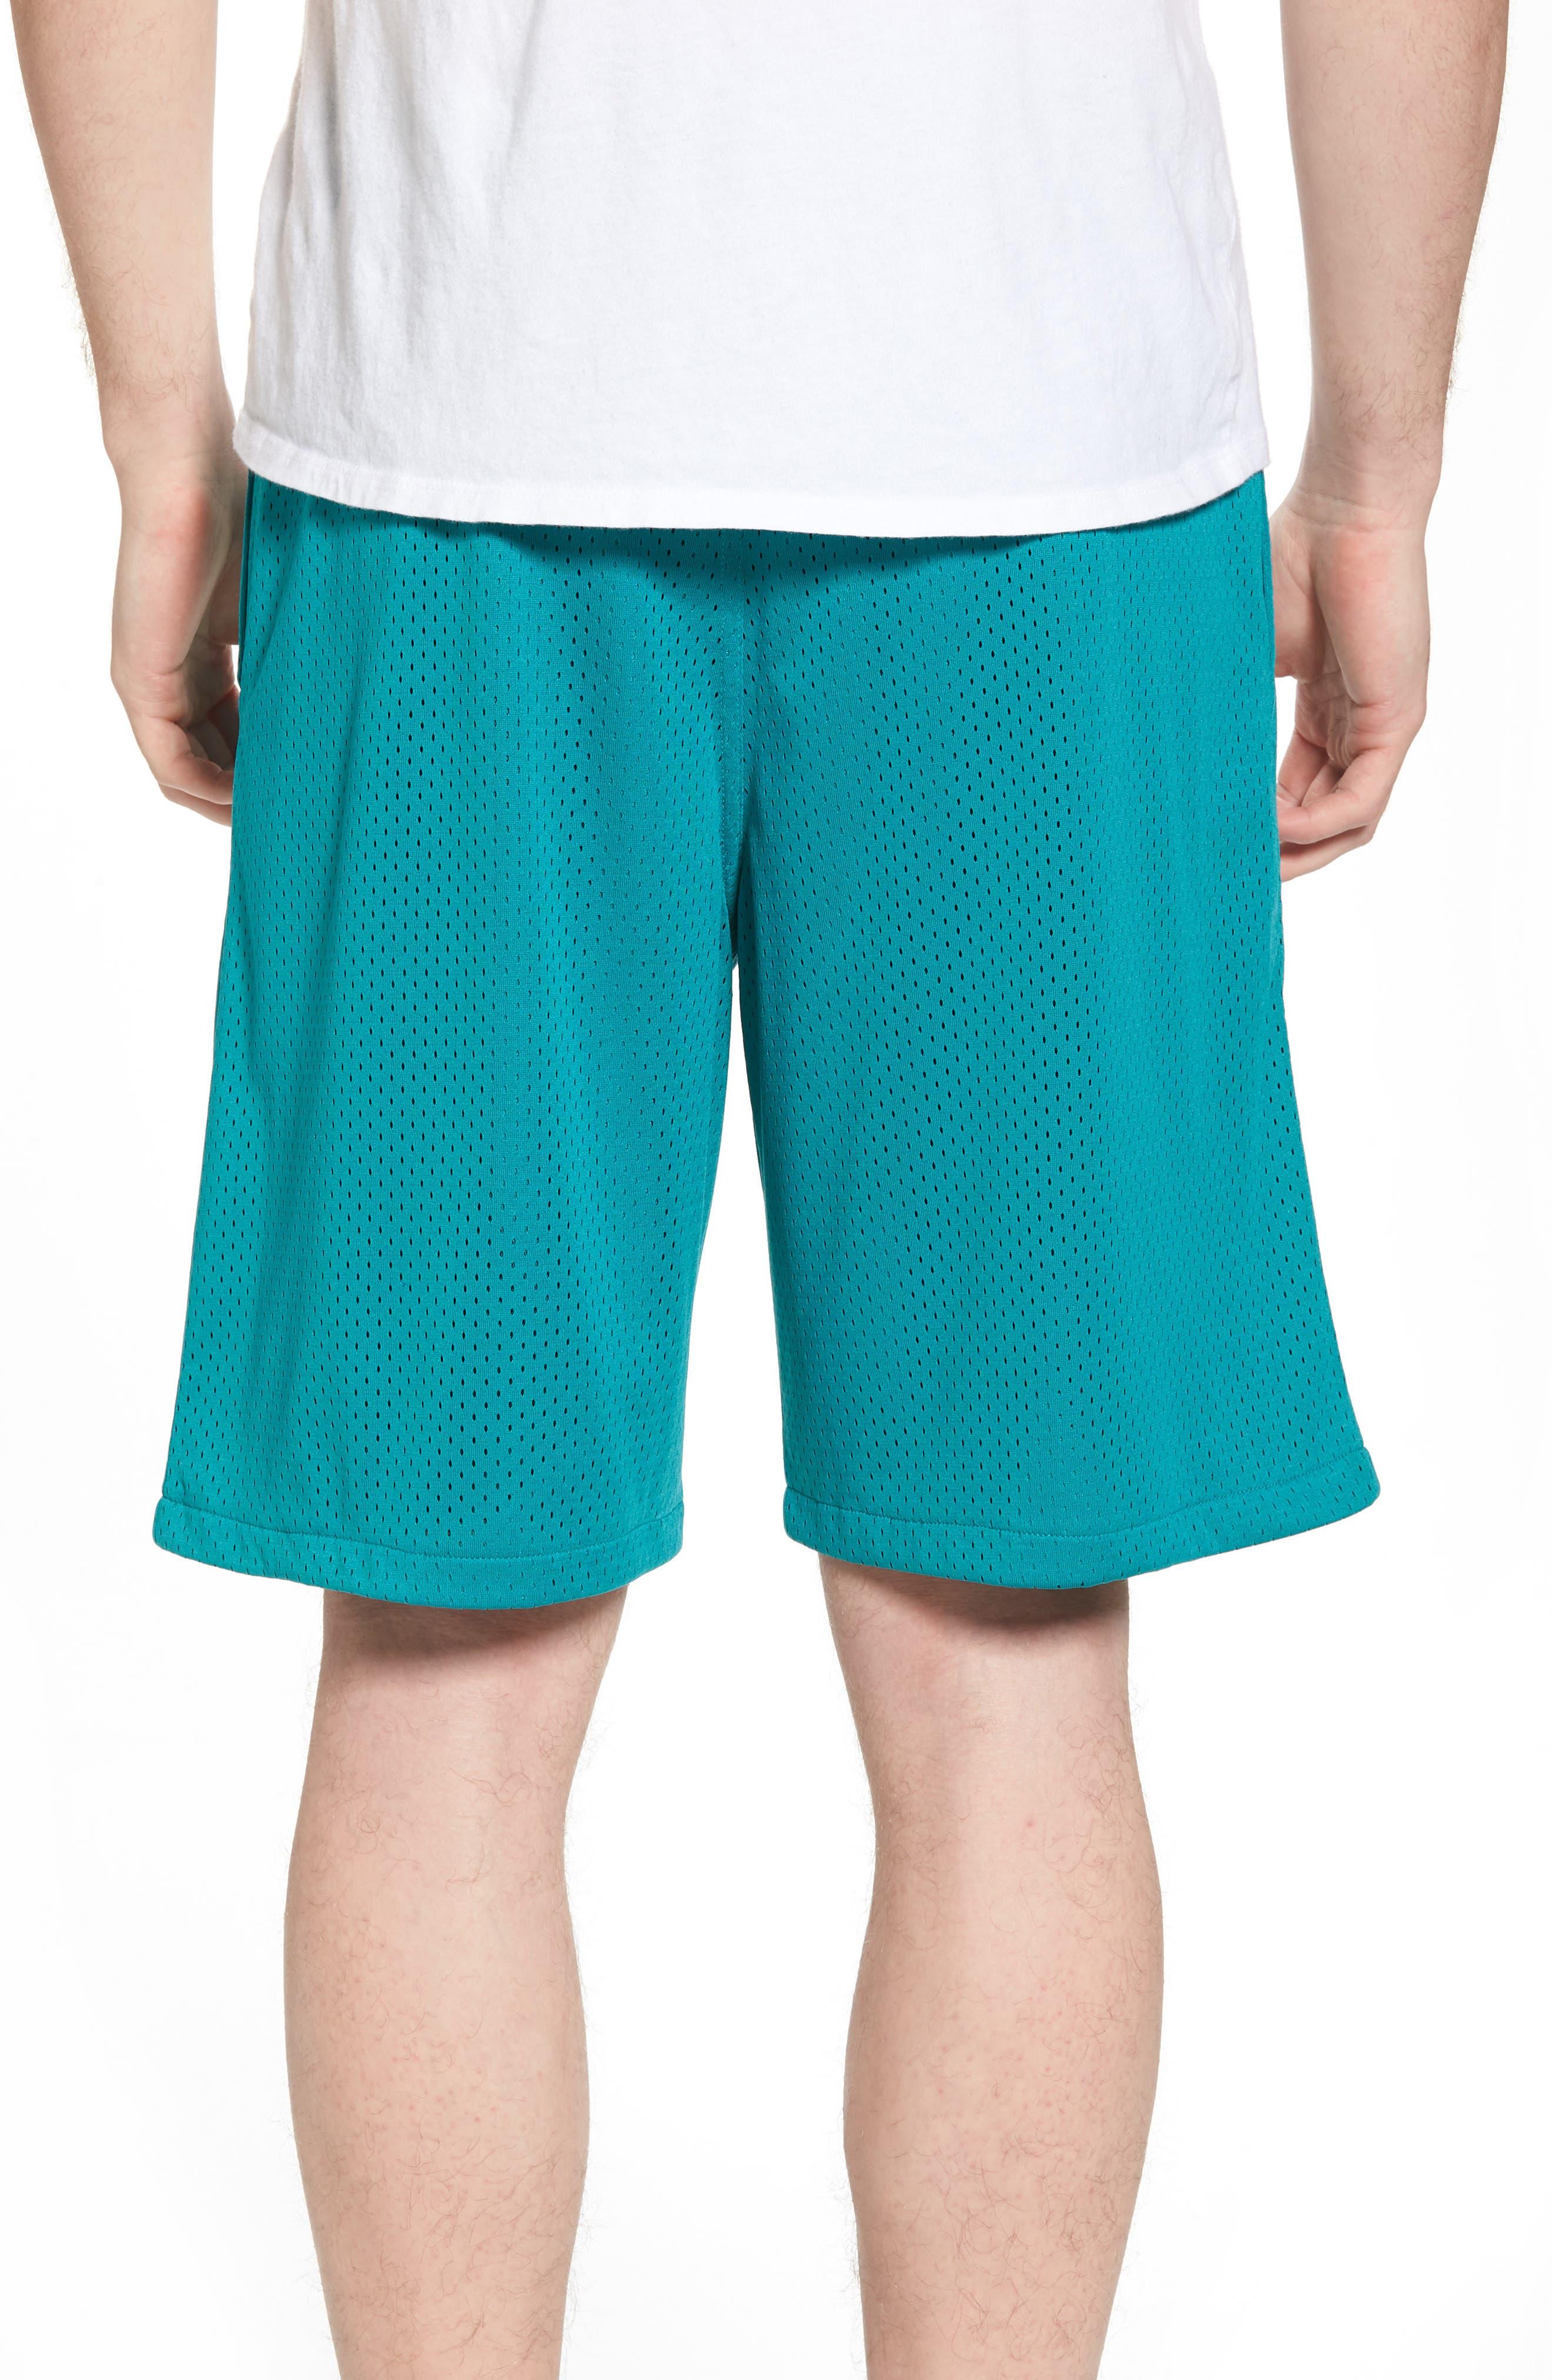 O.P.E. Athletic Shorts,                             Alternate thumbnail 2, color,                             Teal